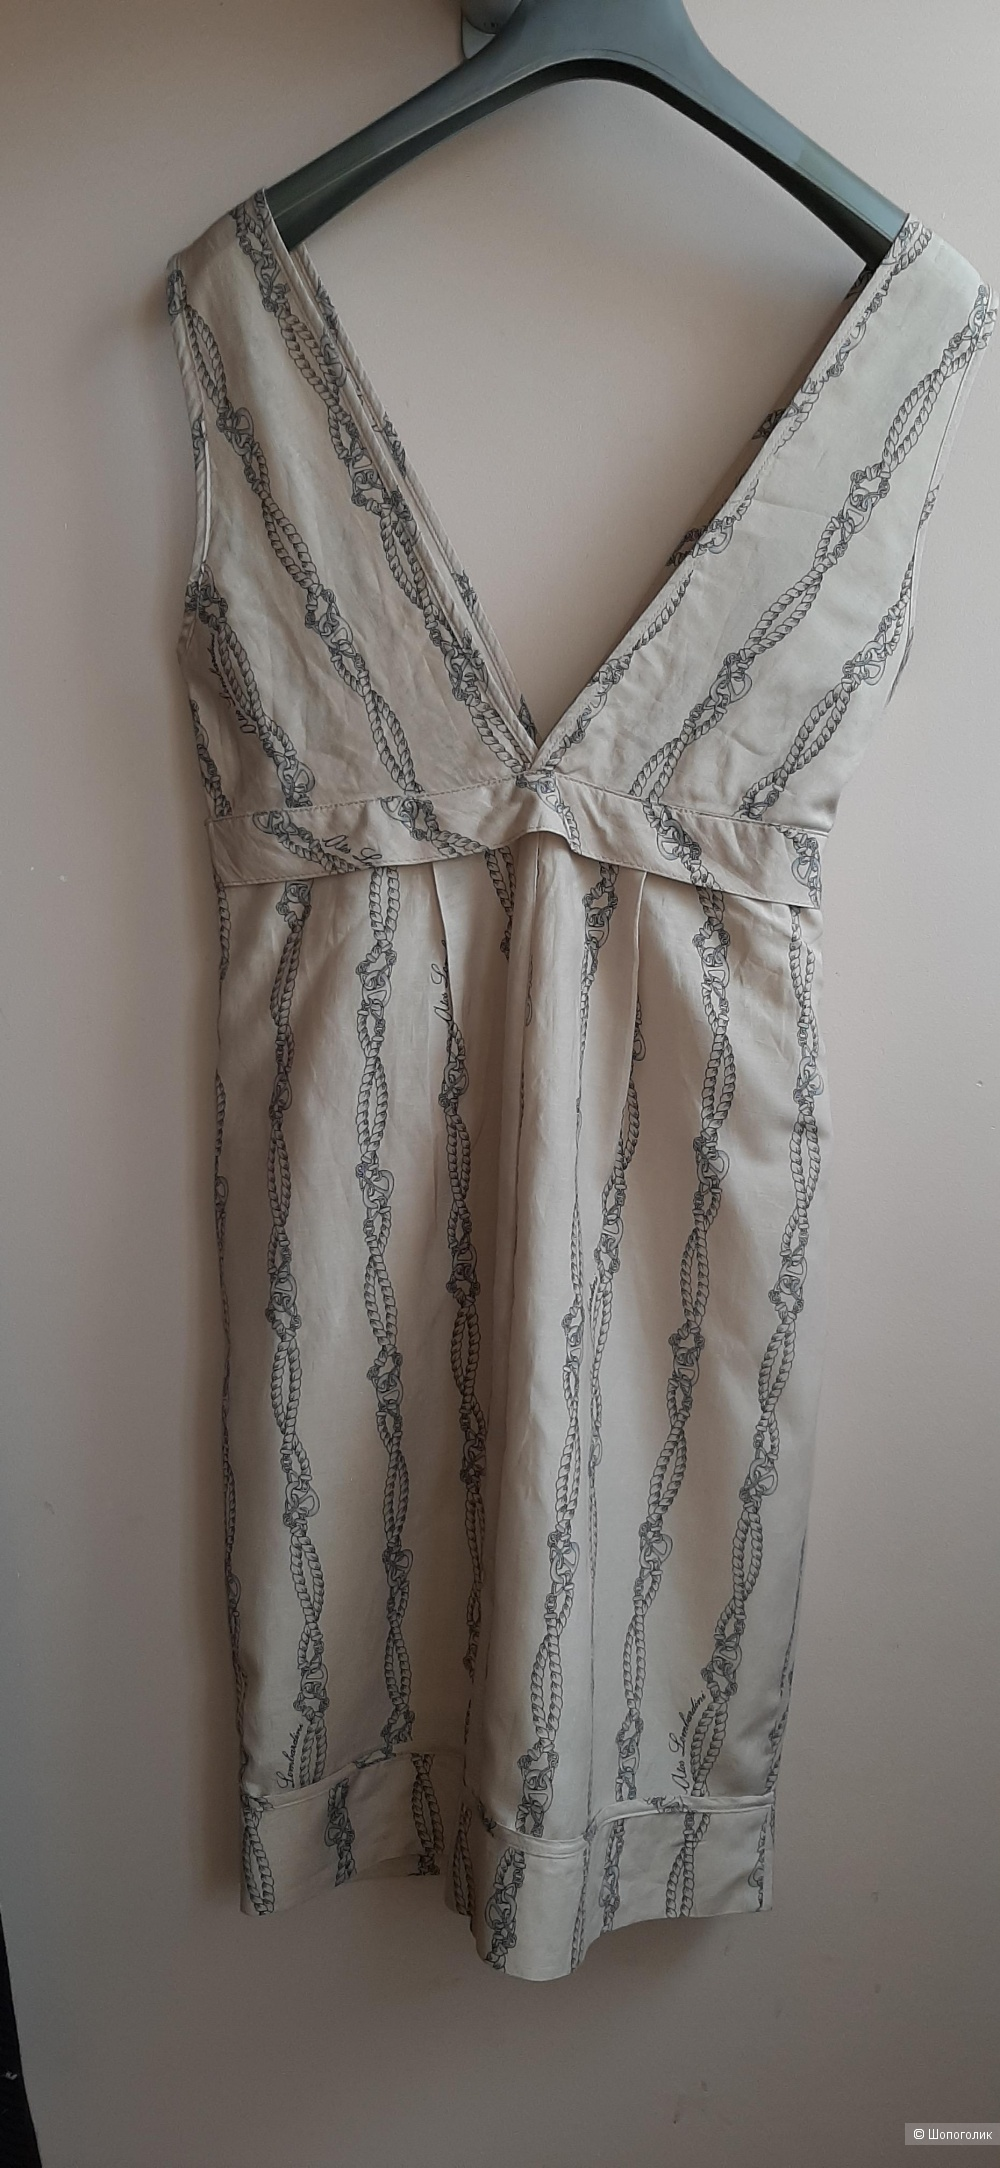 Шелковое платье Atos Lombardini, ит. 40, наш 42